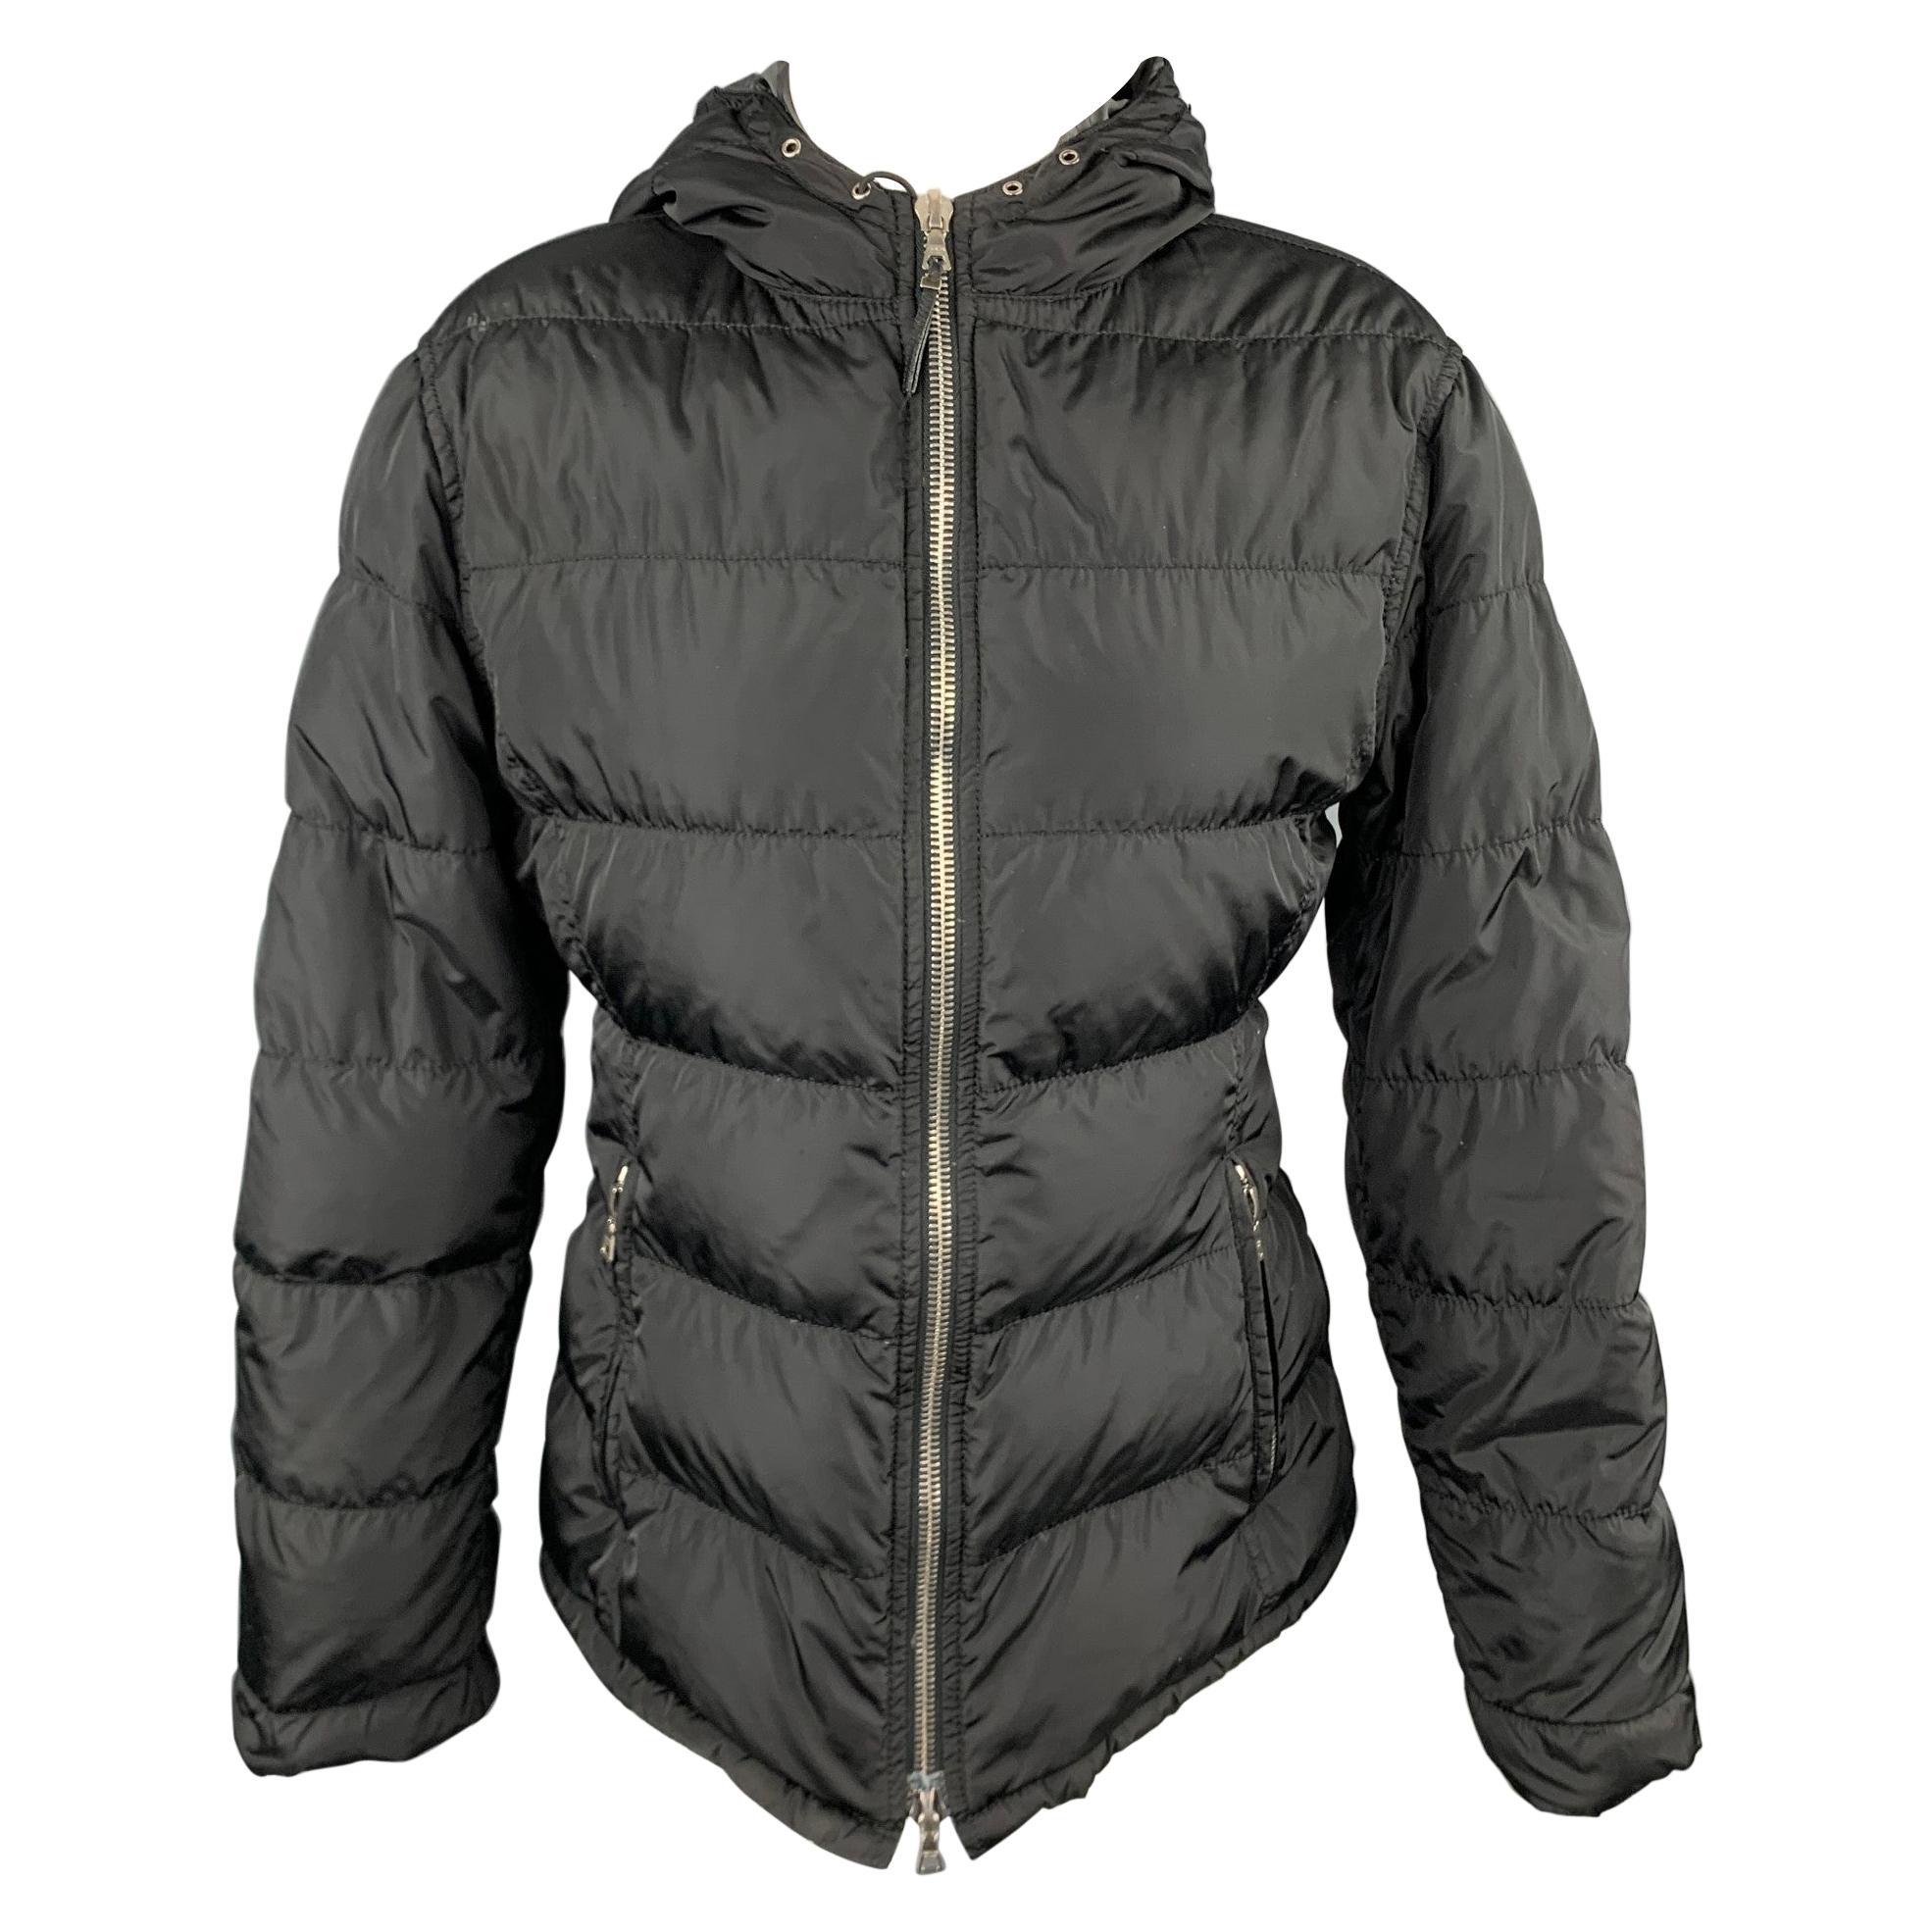 PRADA Size 6 Black Quilted Nylon Hooded Jacket